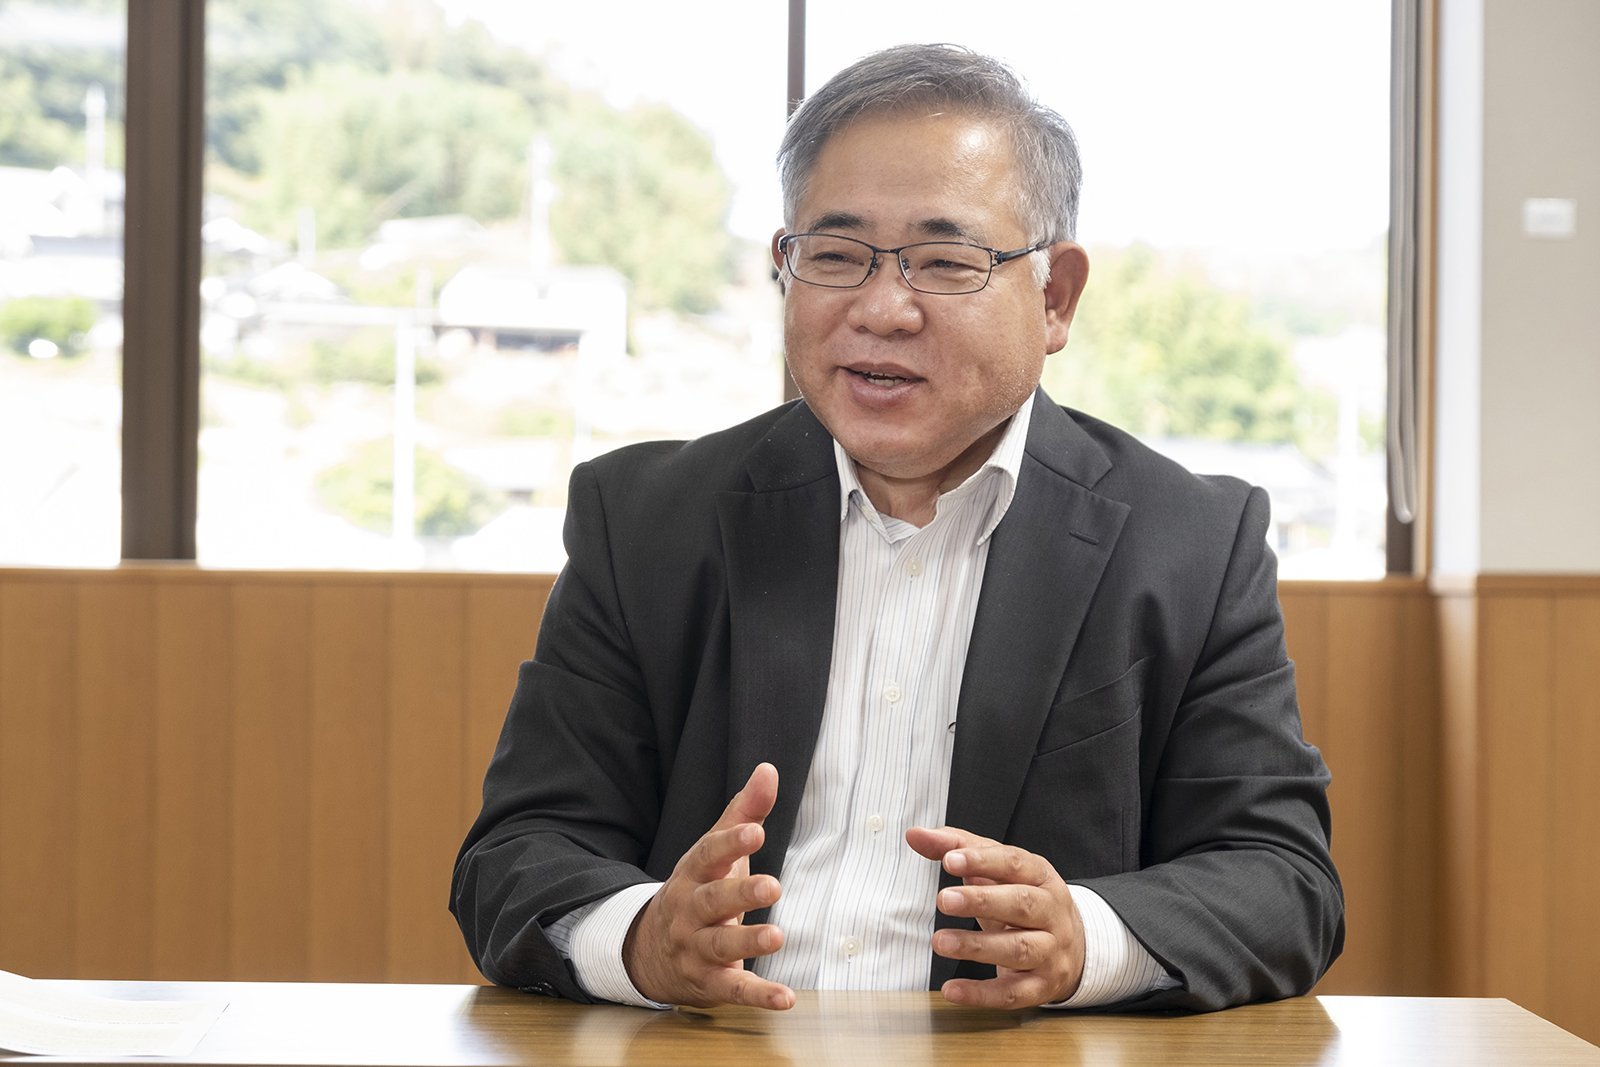 Photo: Takuo Date, Director, Bisei Promotion Division, Bisei Branch Office, Ibara City, Okayama Prefecture